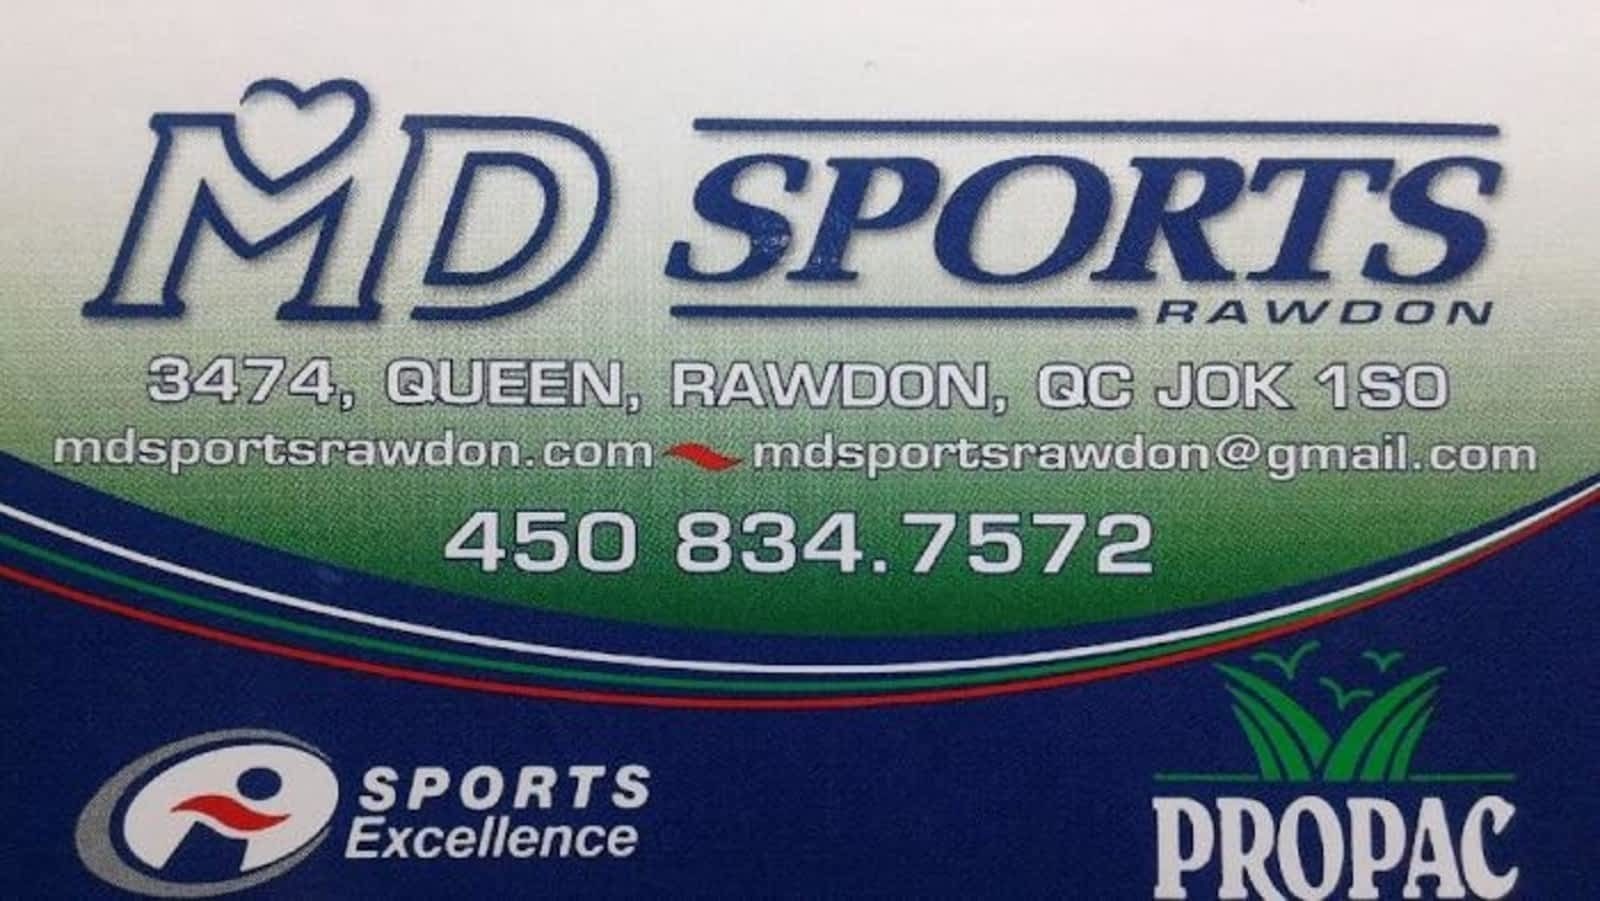 QueenRawdonQc 3474 Rue M D'ouverture Sports Rawdon Horaire D iuTXZPOk